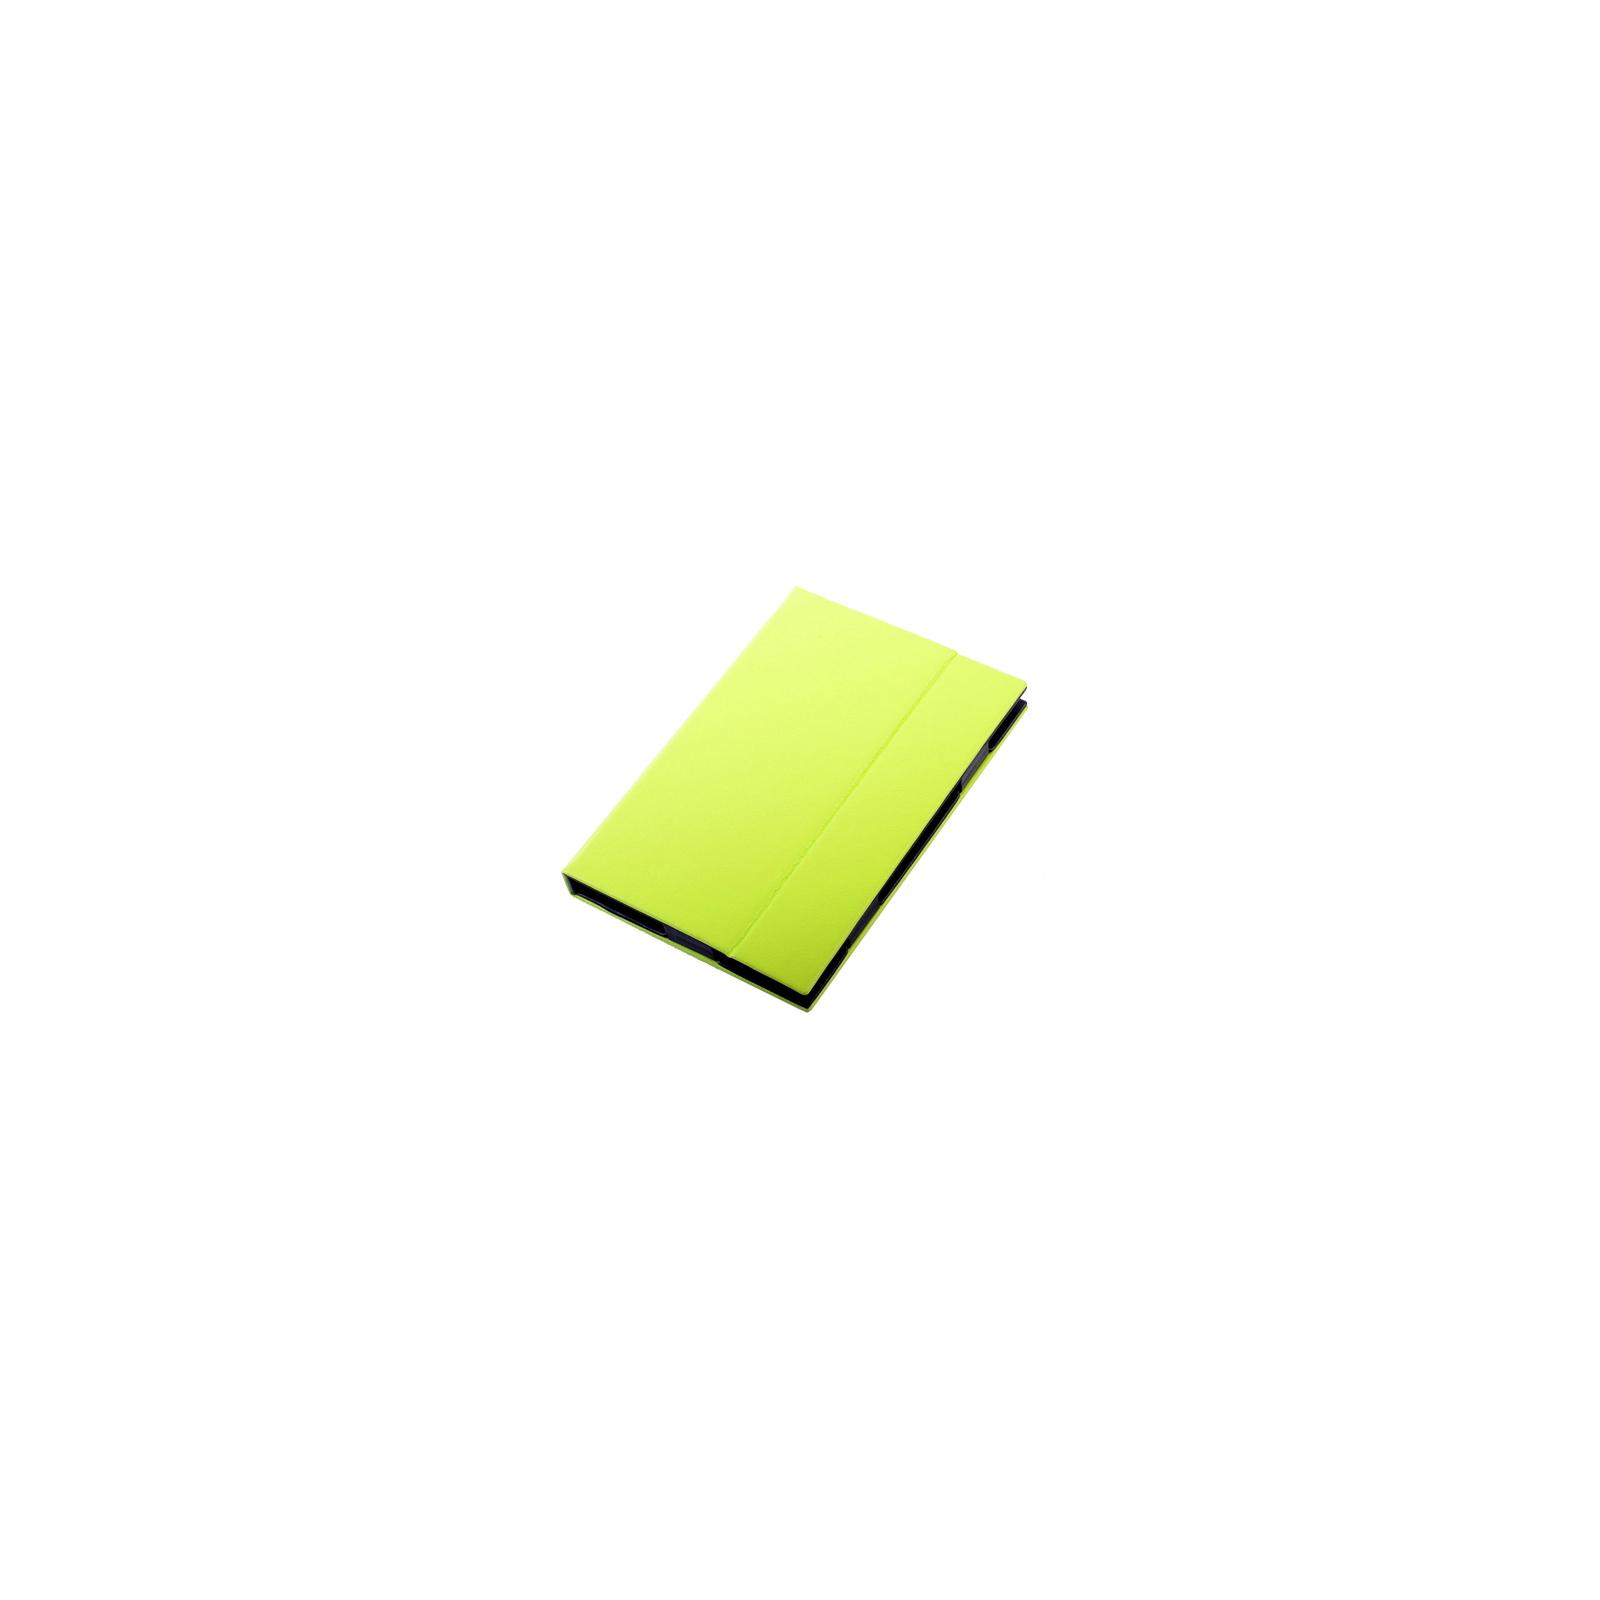 Чехол для планшета Vento 8 Desire Bright - lime